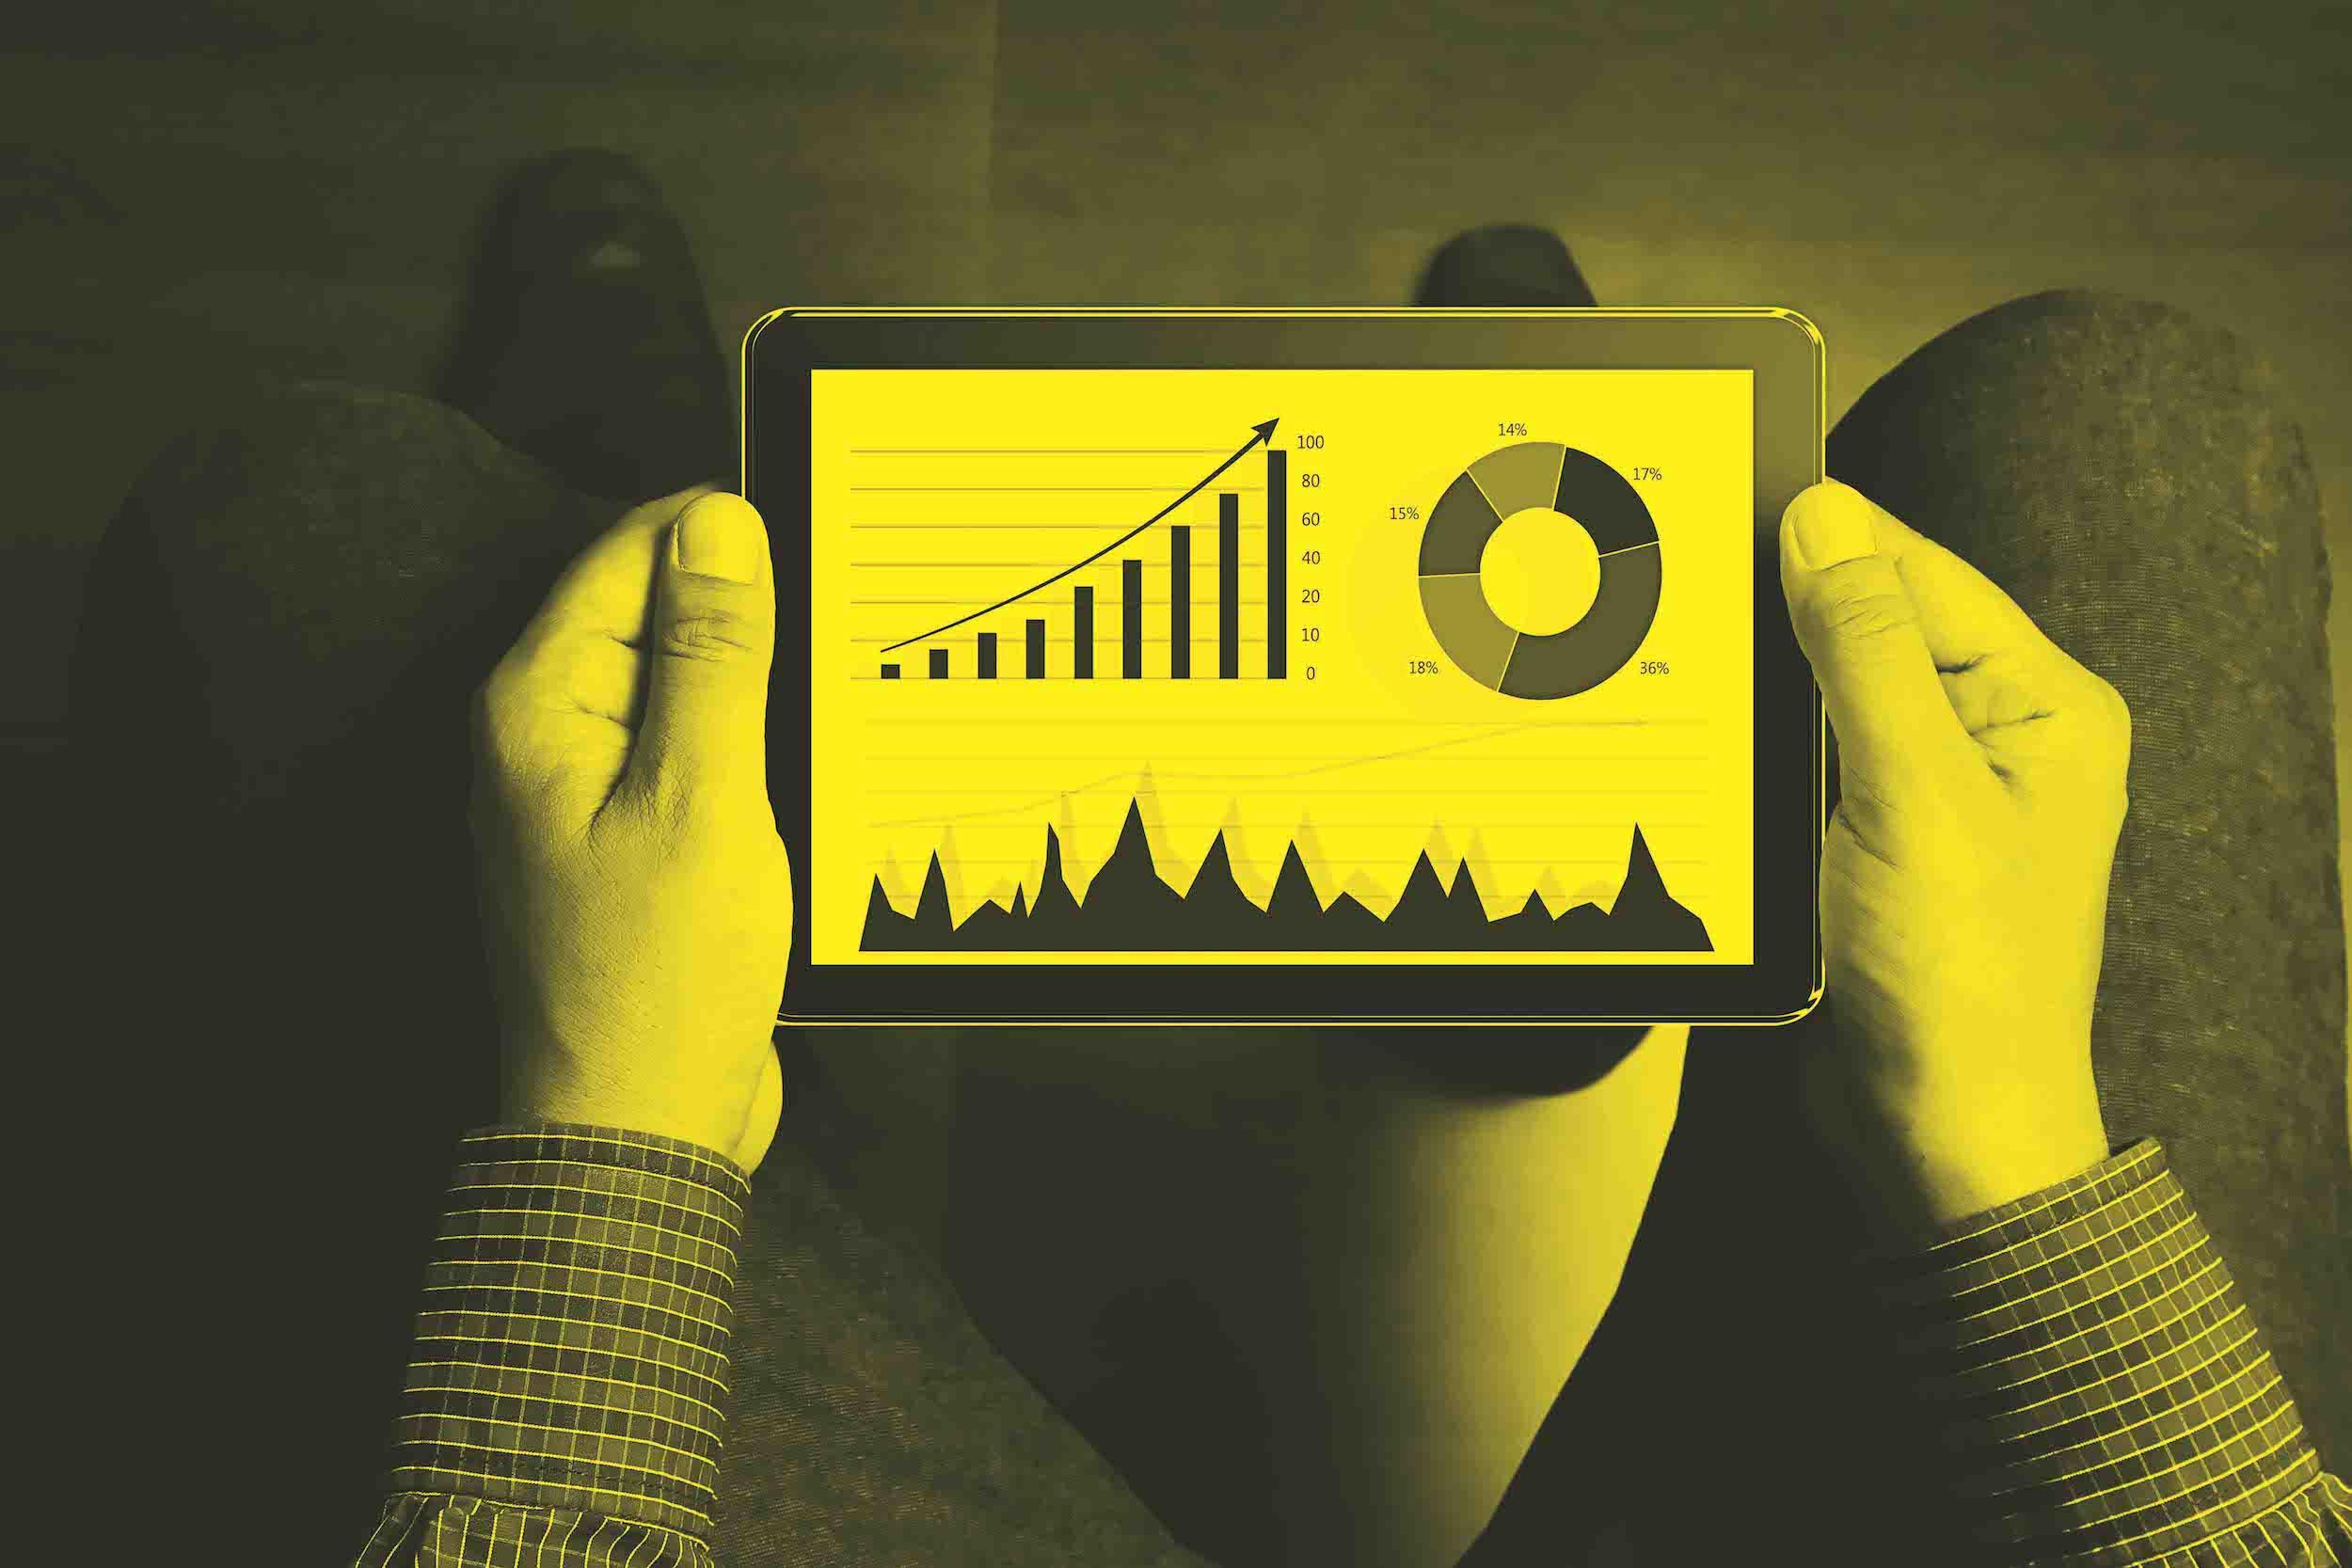 Tablet_Data_yellow.jpg